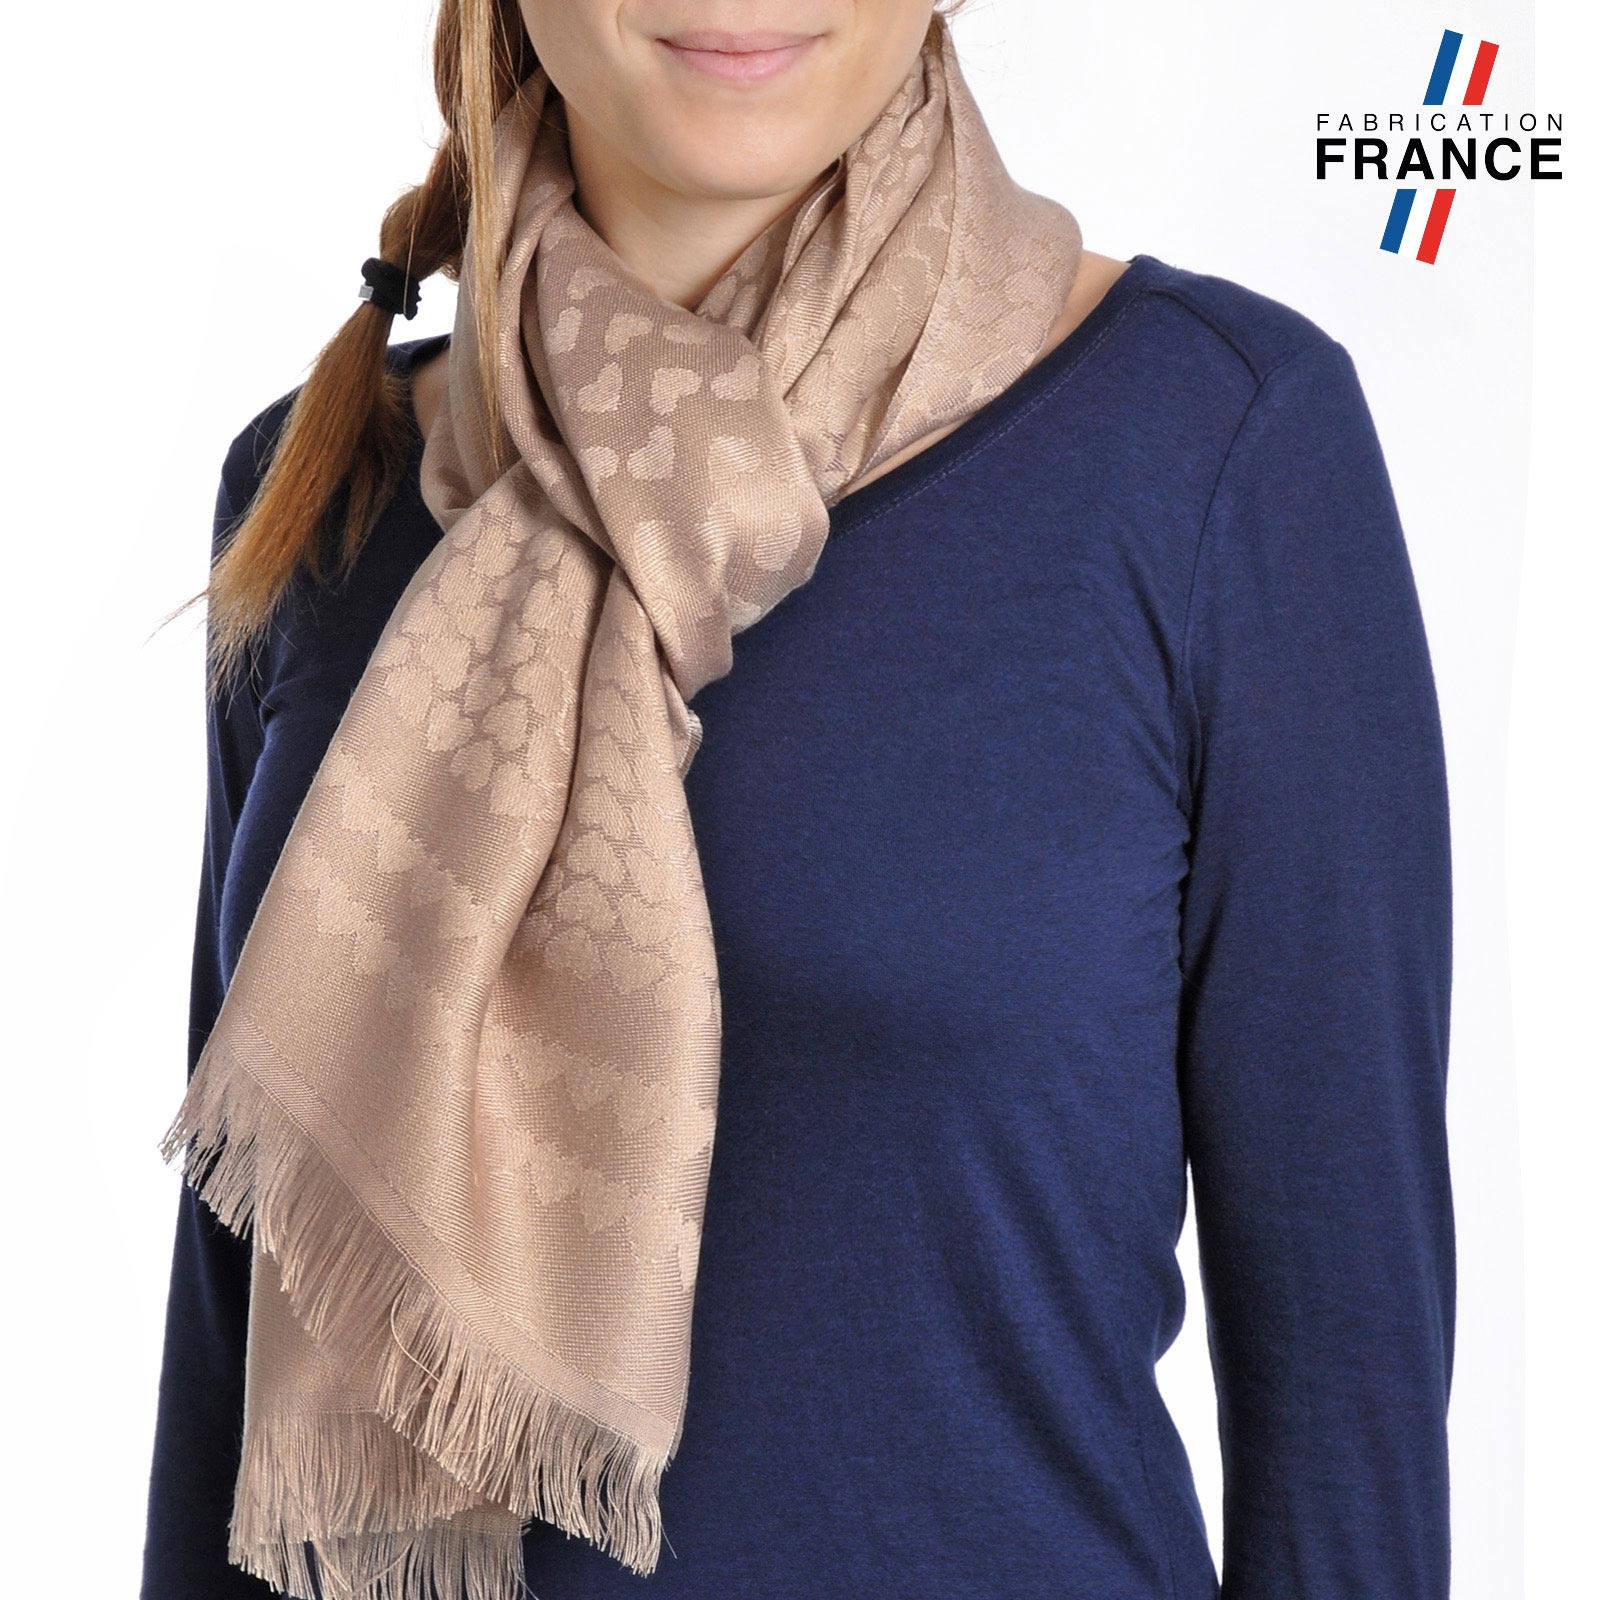 AT-04268-VF10-T-LB_FR-echarpe-qualicoq-motifs-coeurs-beige